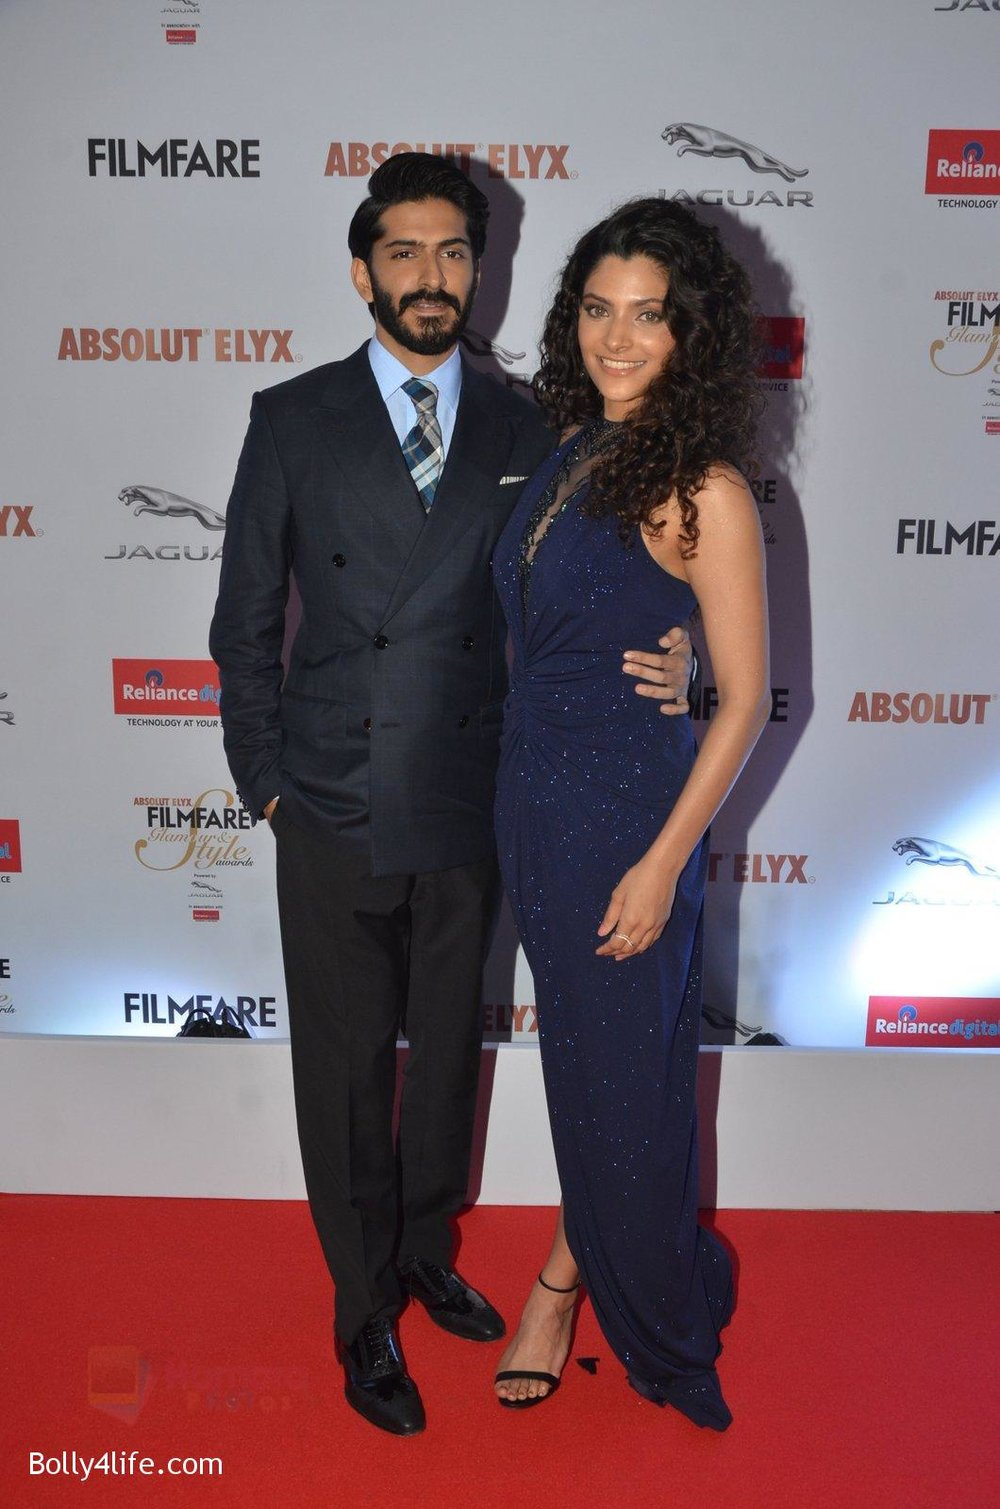 Harshvardhan-Kapoor-Saiyami-Kher-at-Filmfare-Glamour-Style-Awards-2016-in-Mumbai-on-15th-Oct-2016-1307.jpg